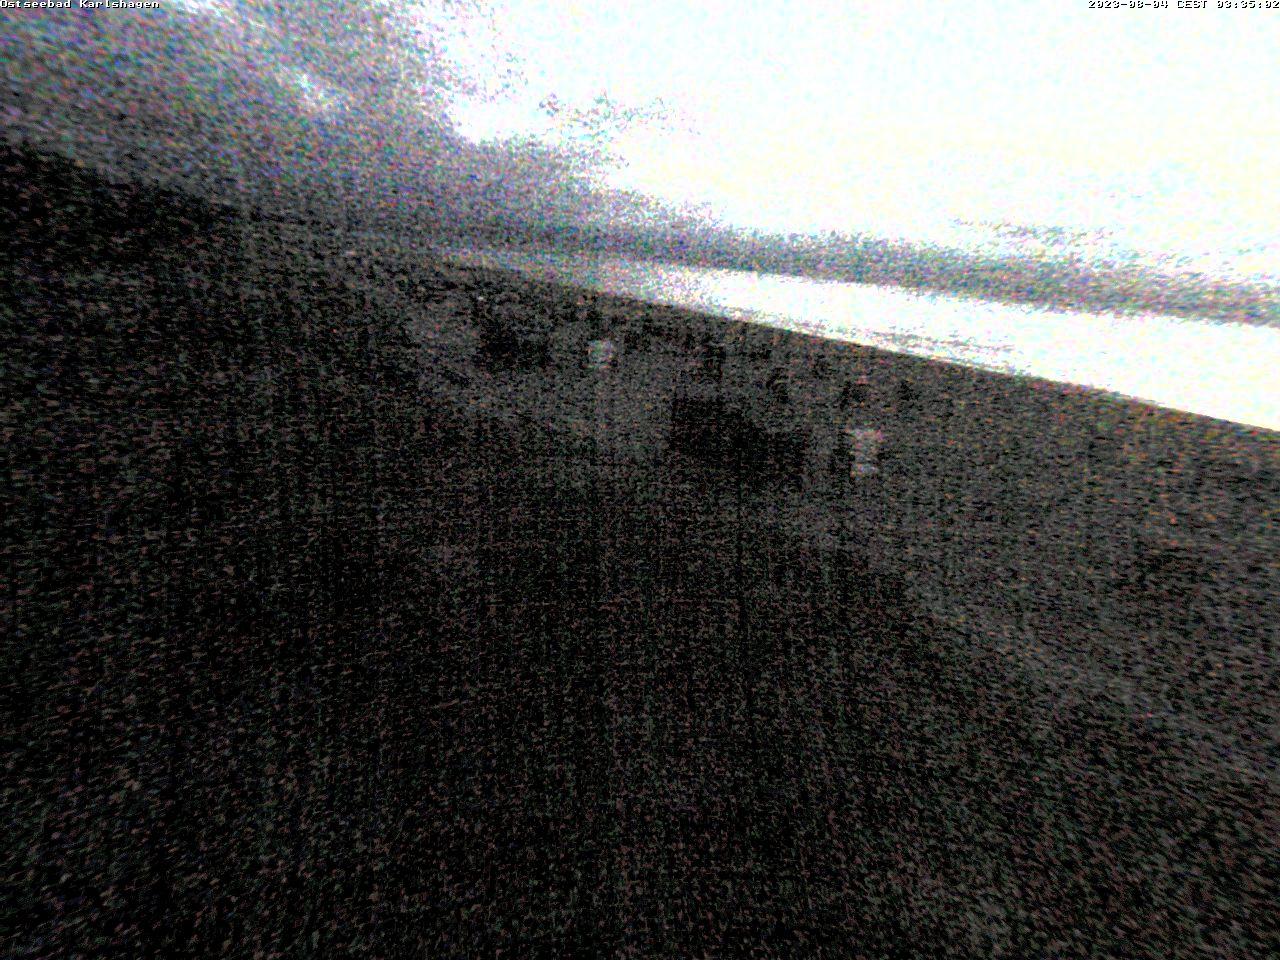 Karlshagen: Blick auf den Strand